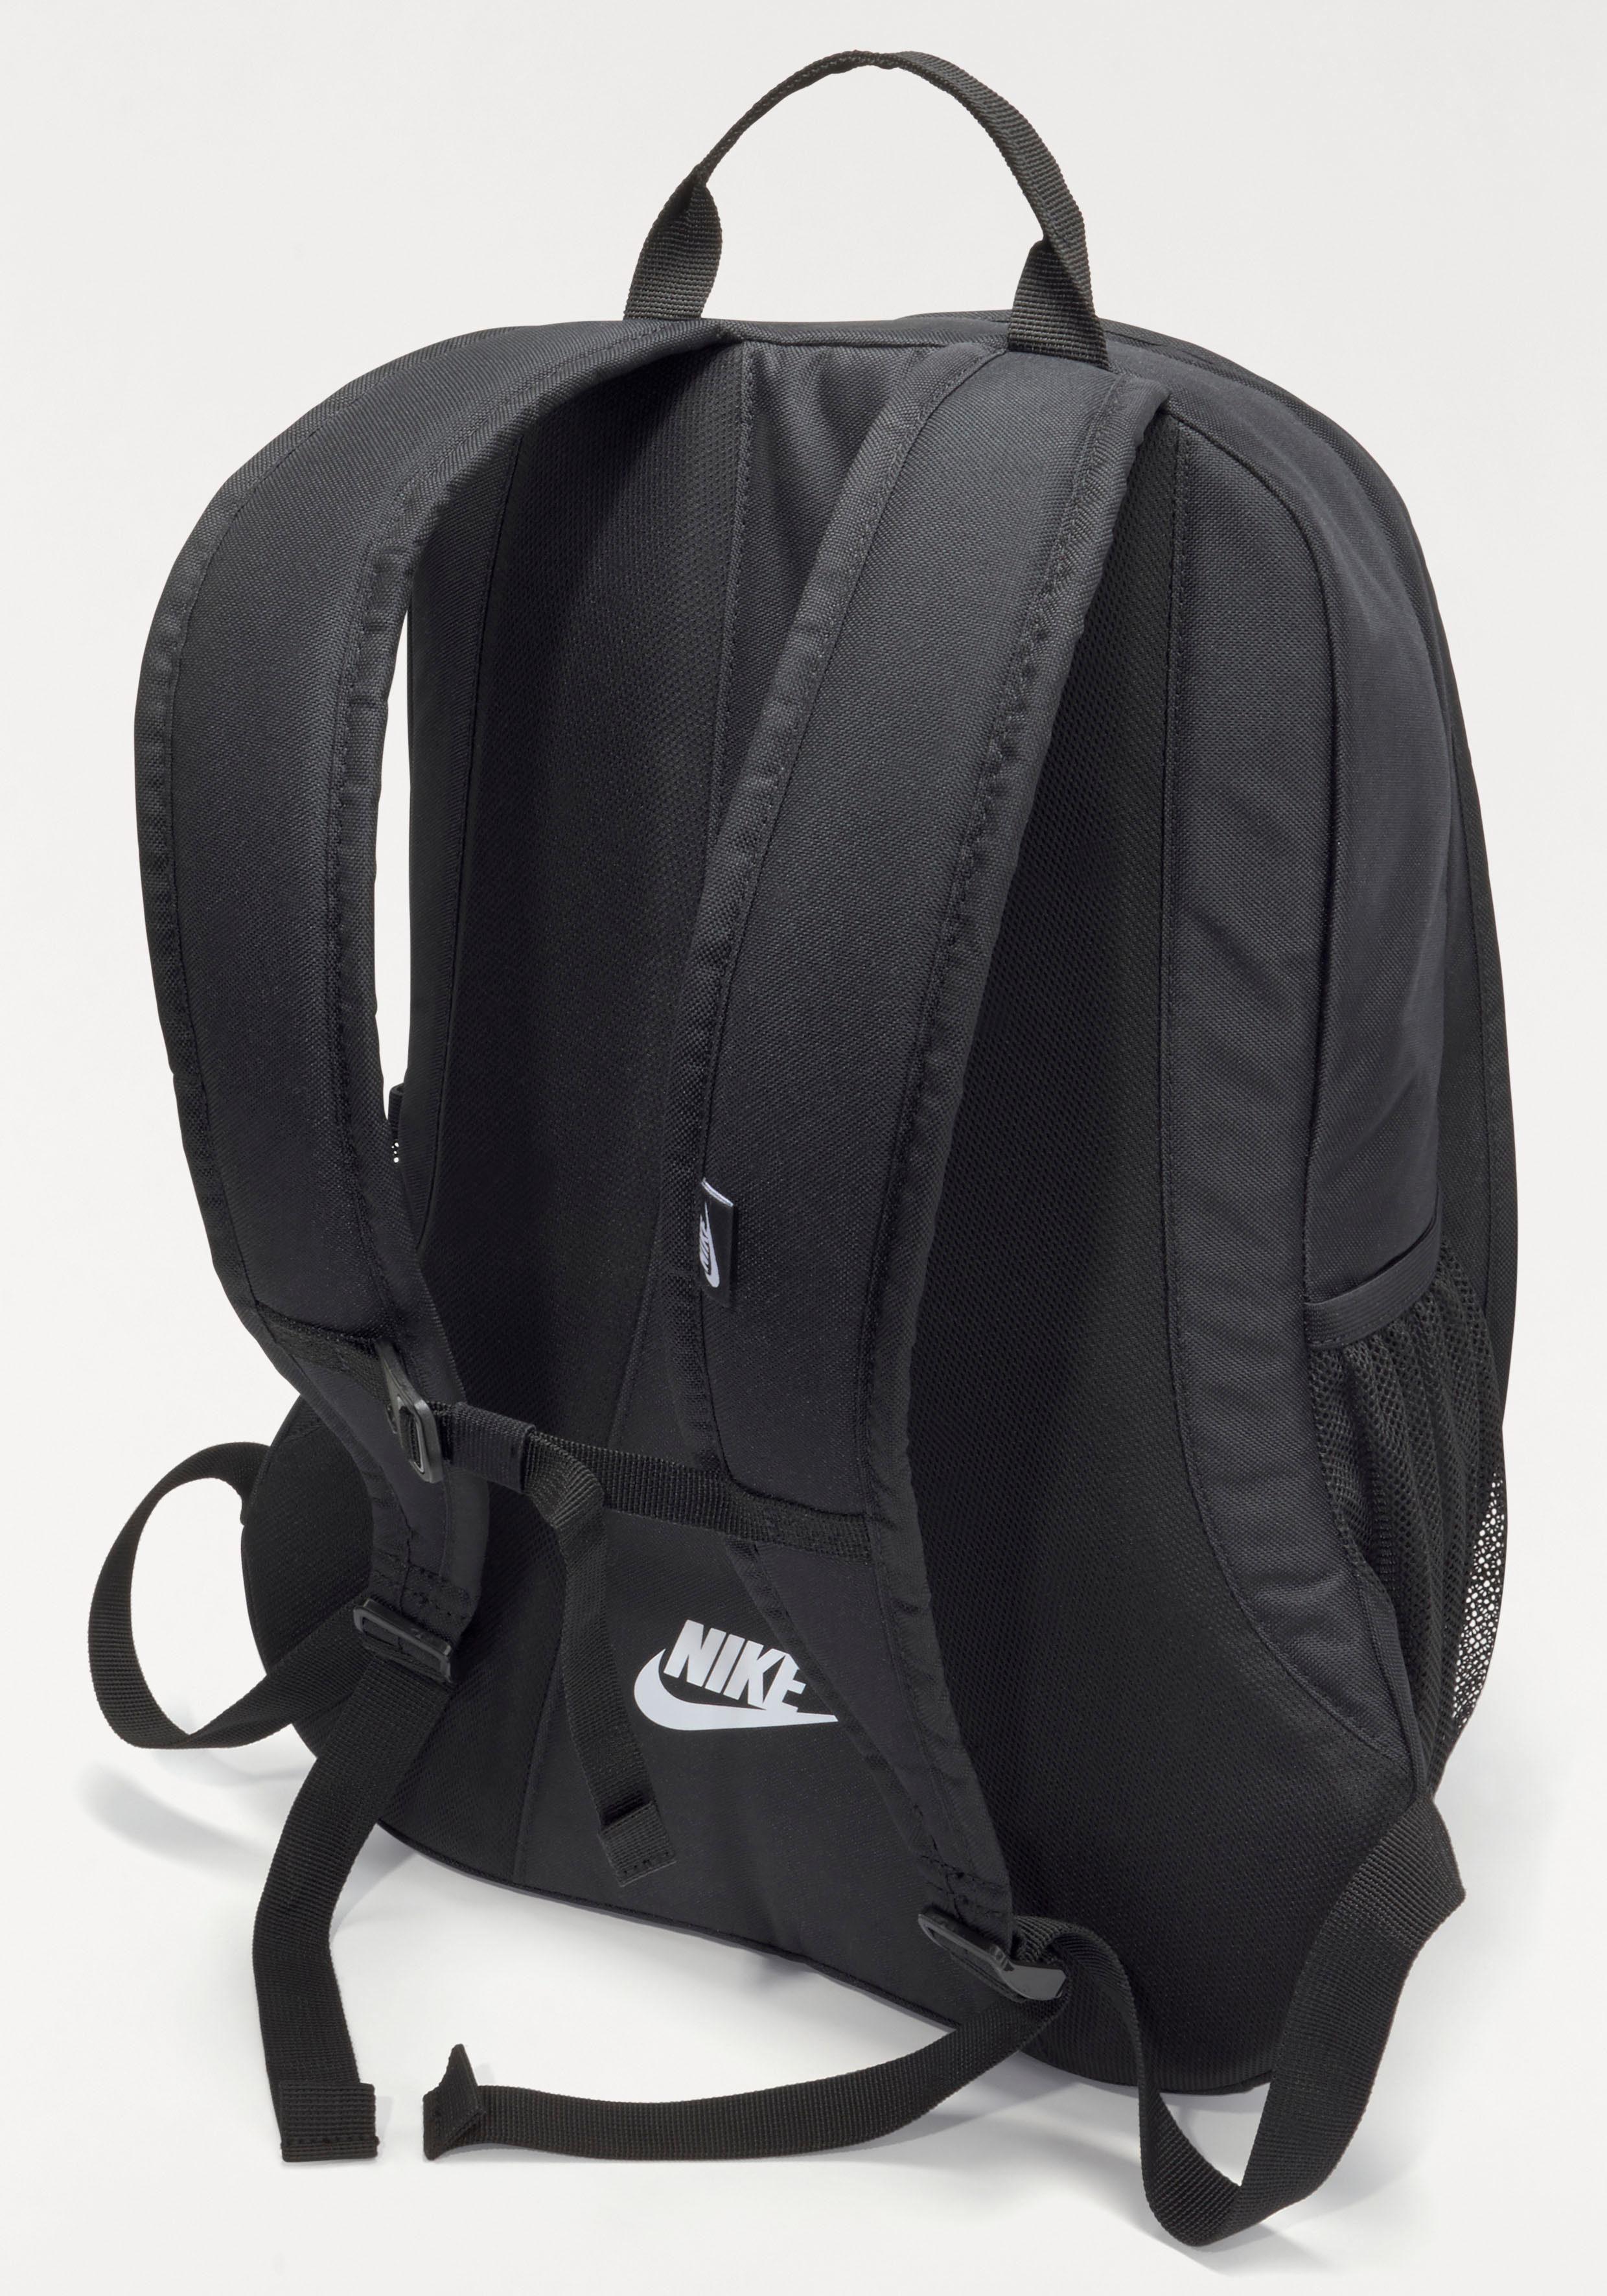 Hayward Futura Sportswear »nsw Sportrucksack Backkpack« Nike 6qtTv6